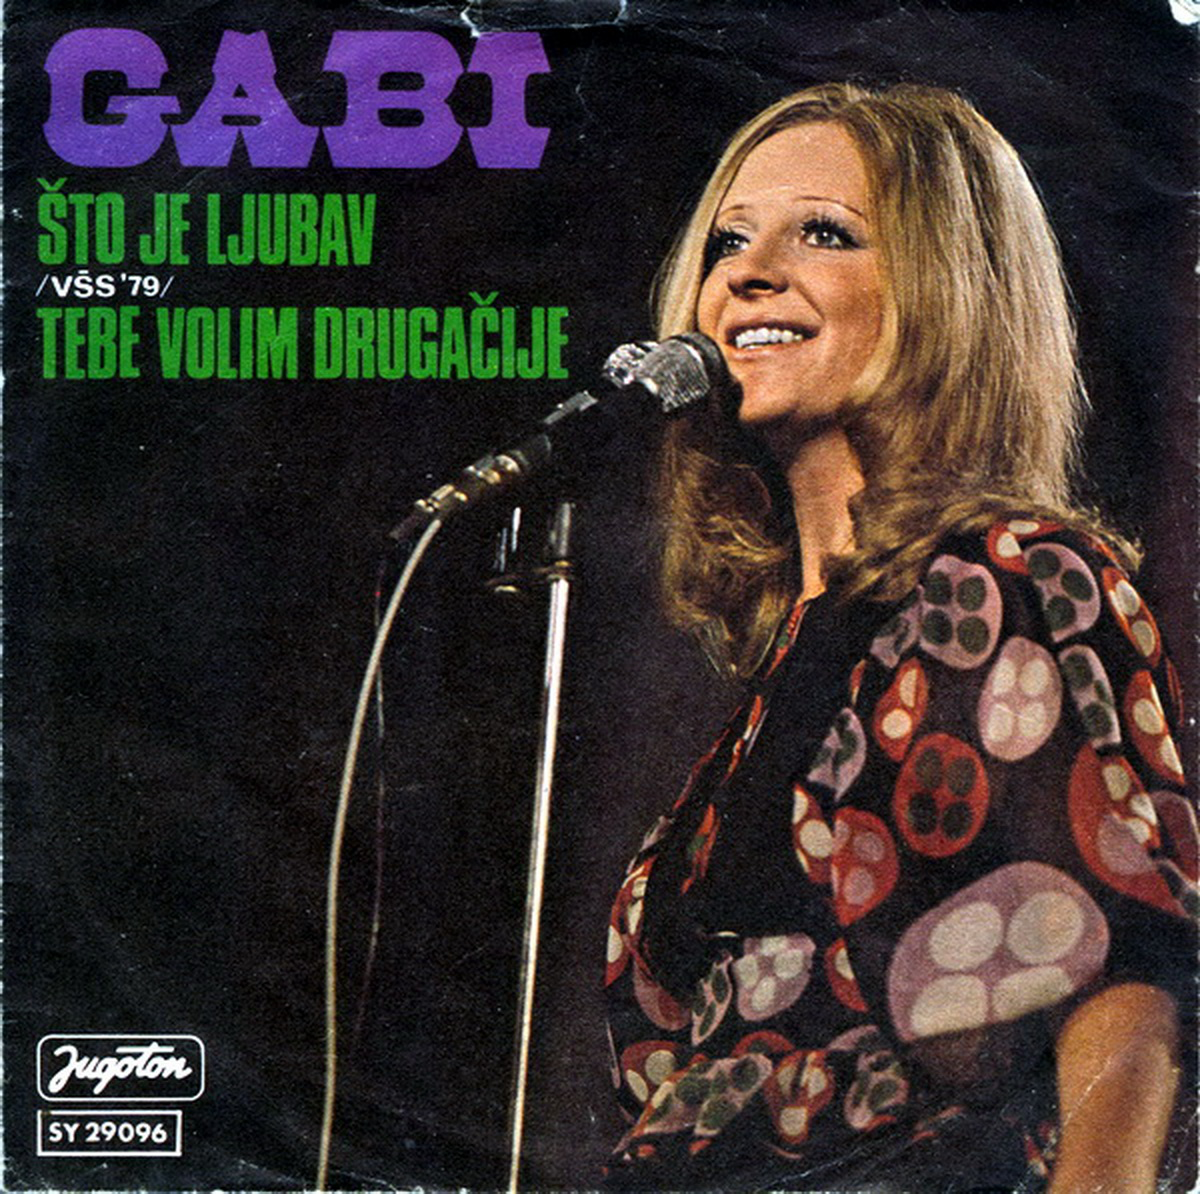 Gabi Novak 1979 Sto je ljubav a